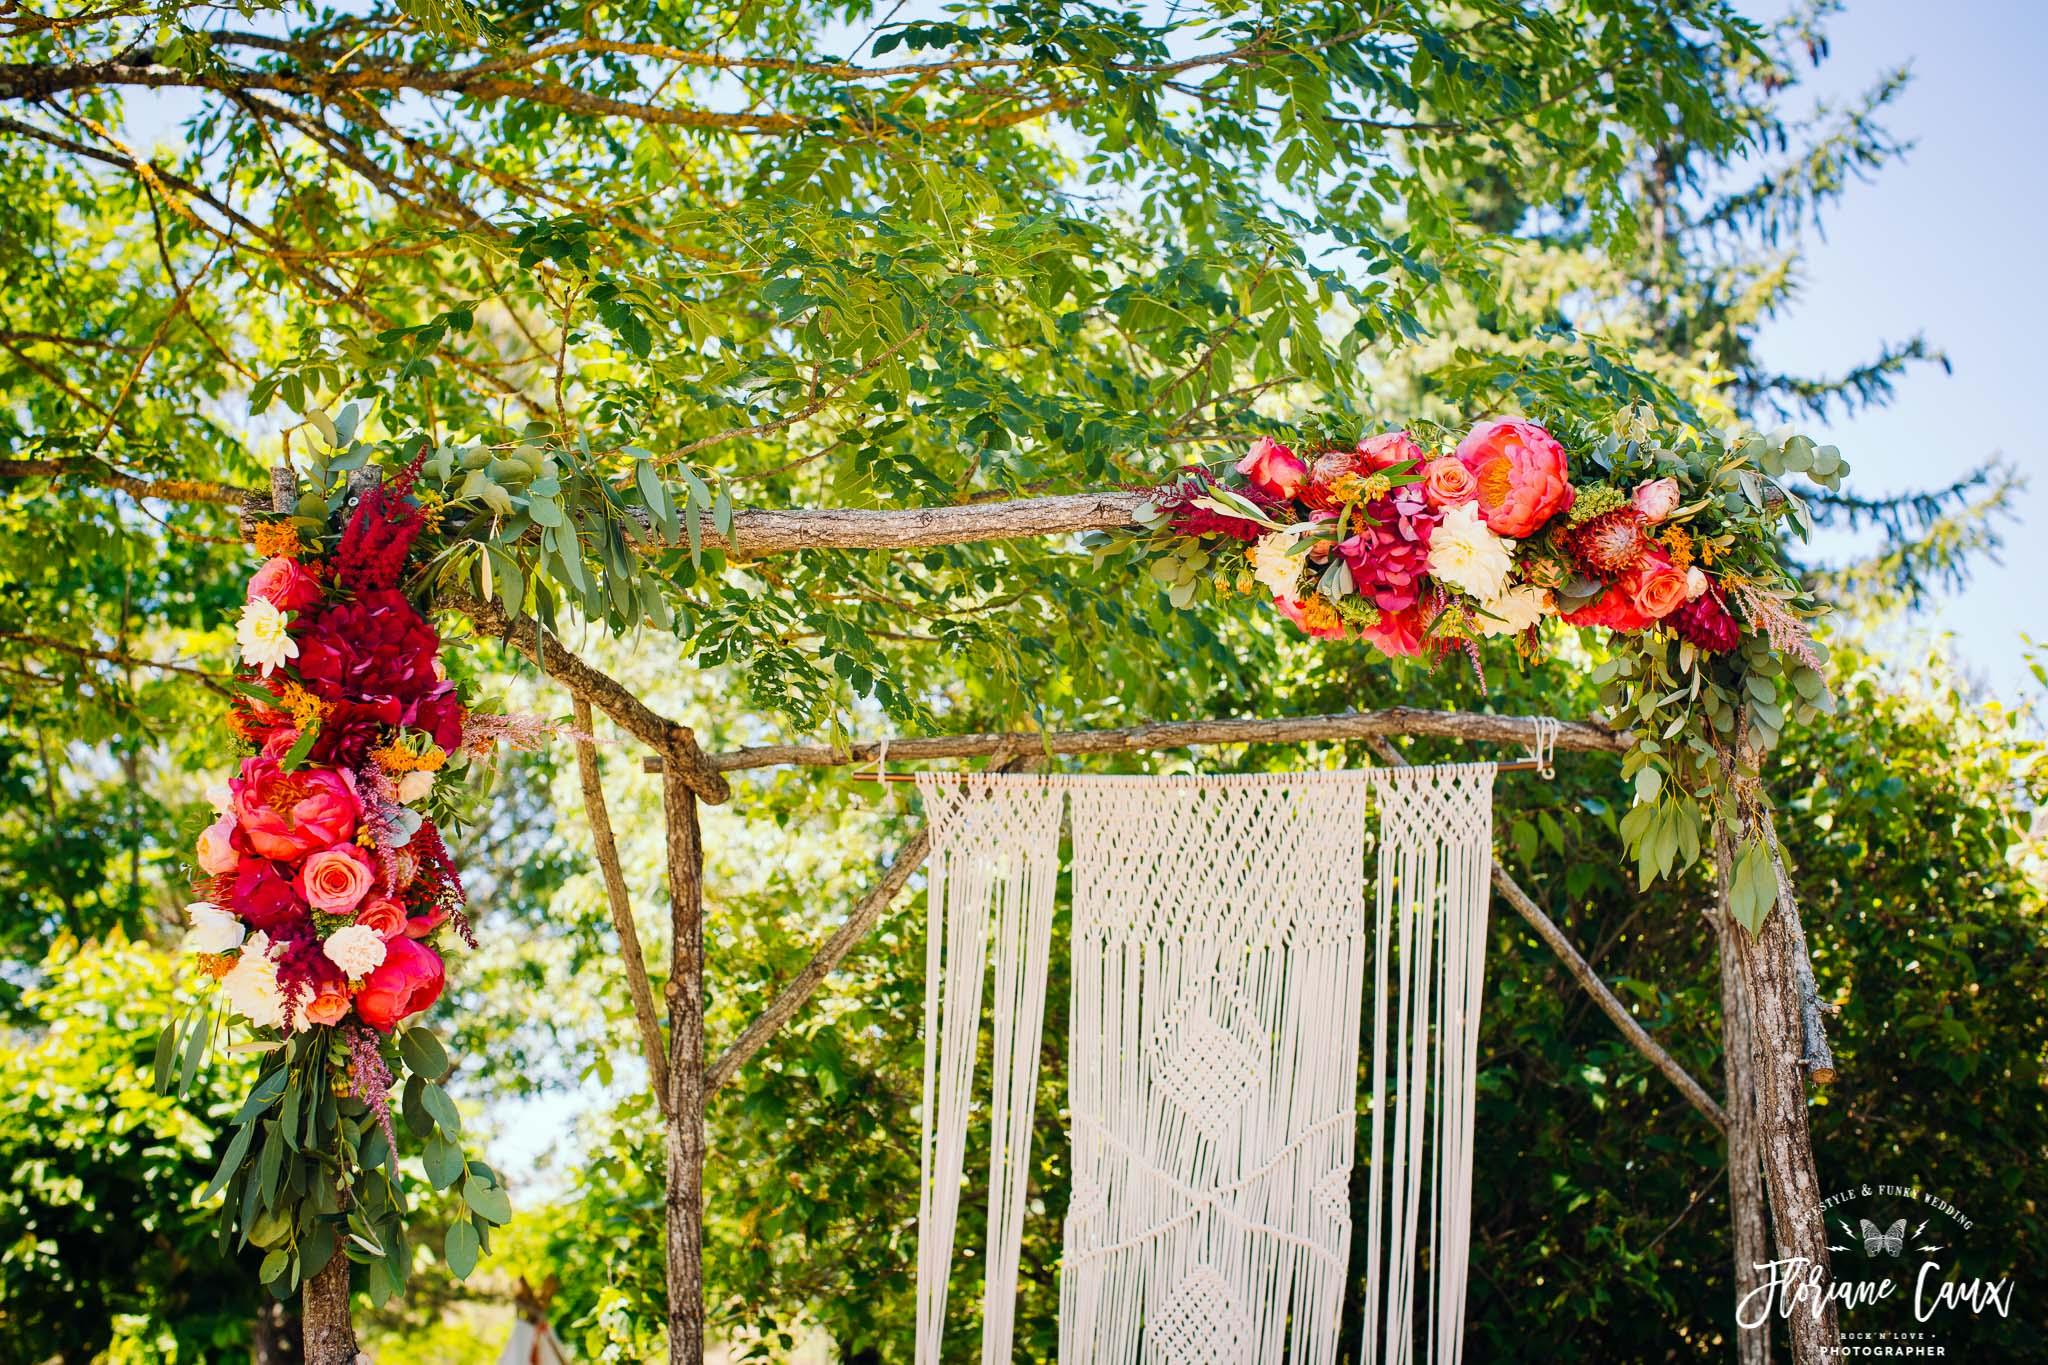 mariage-festival-cahors-ceremonie-laique-velo-licorne-2